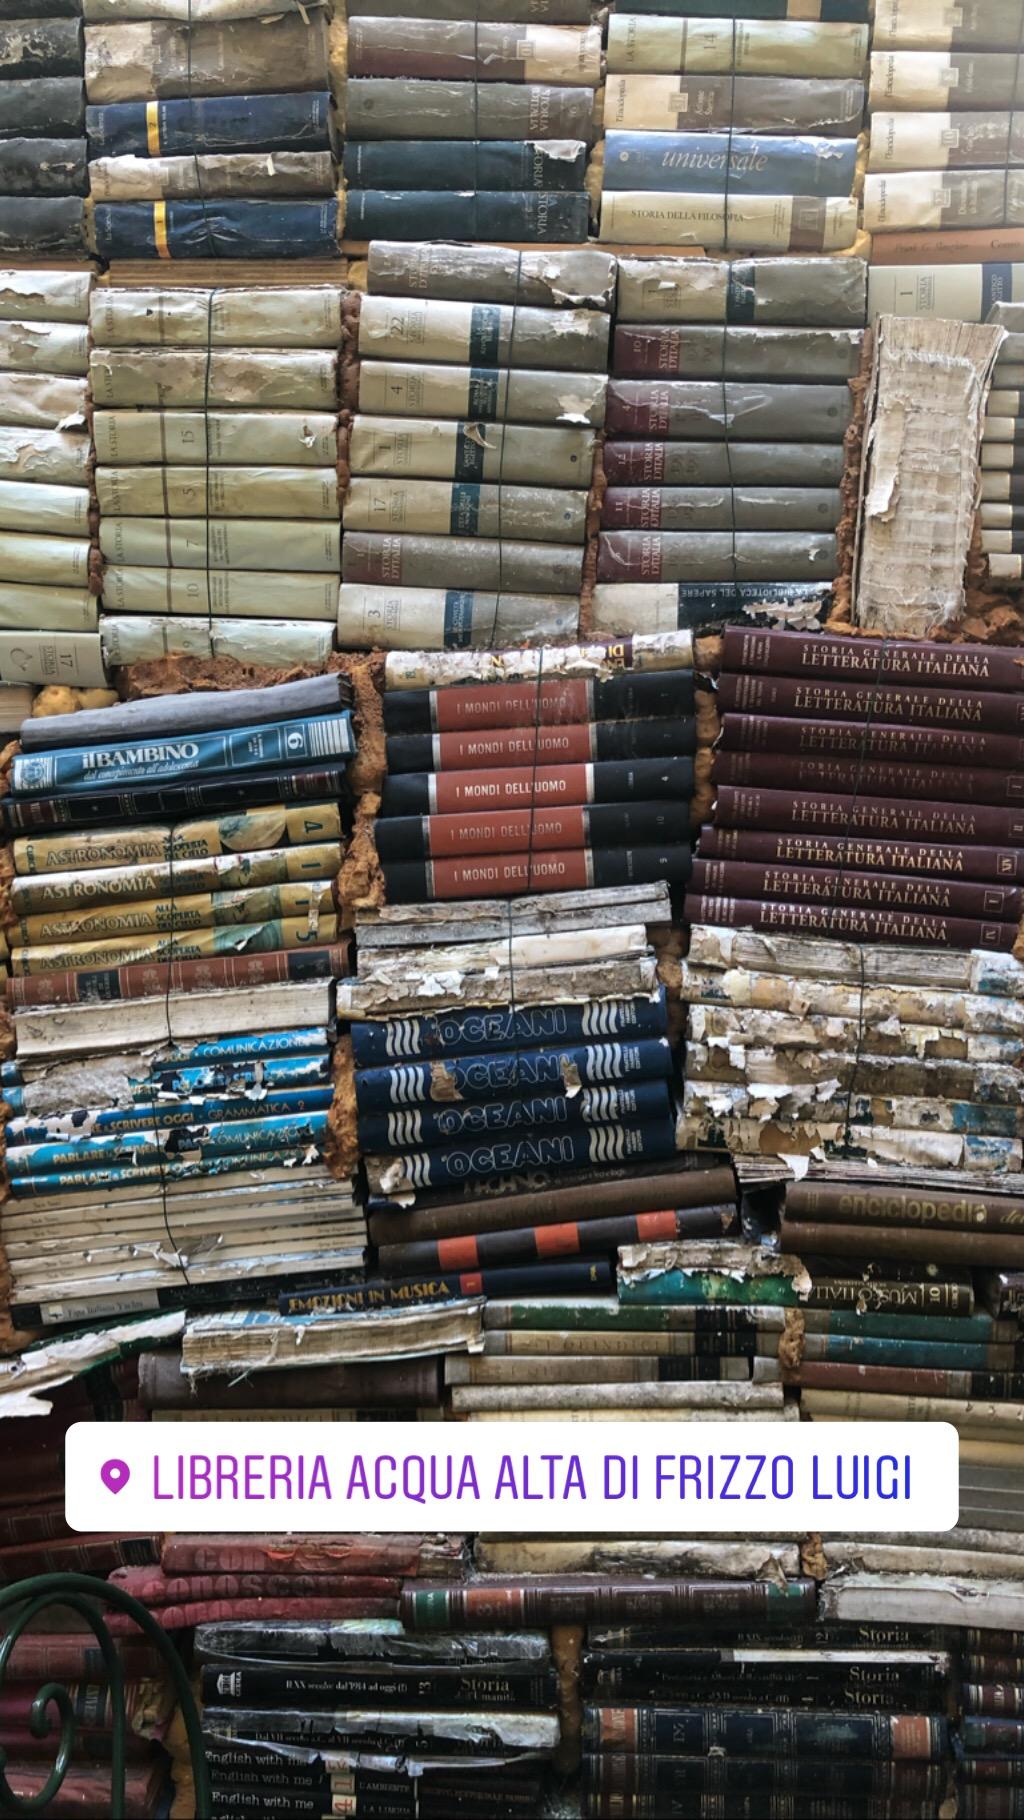 Water damaged books at Acqua Alta